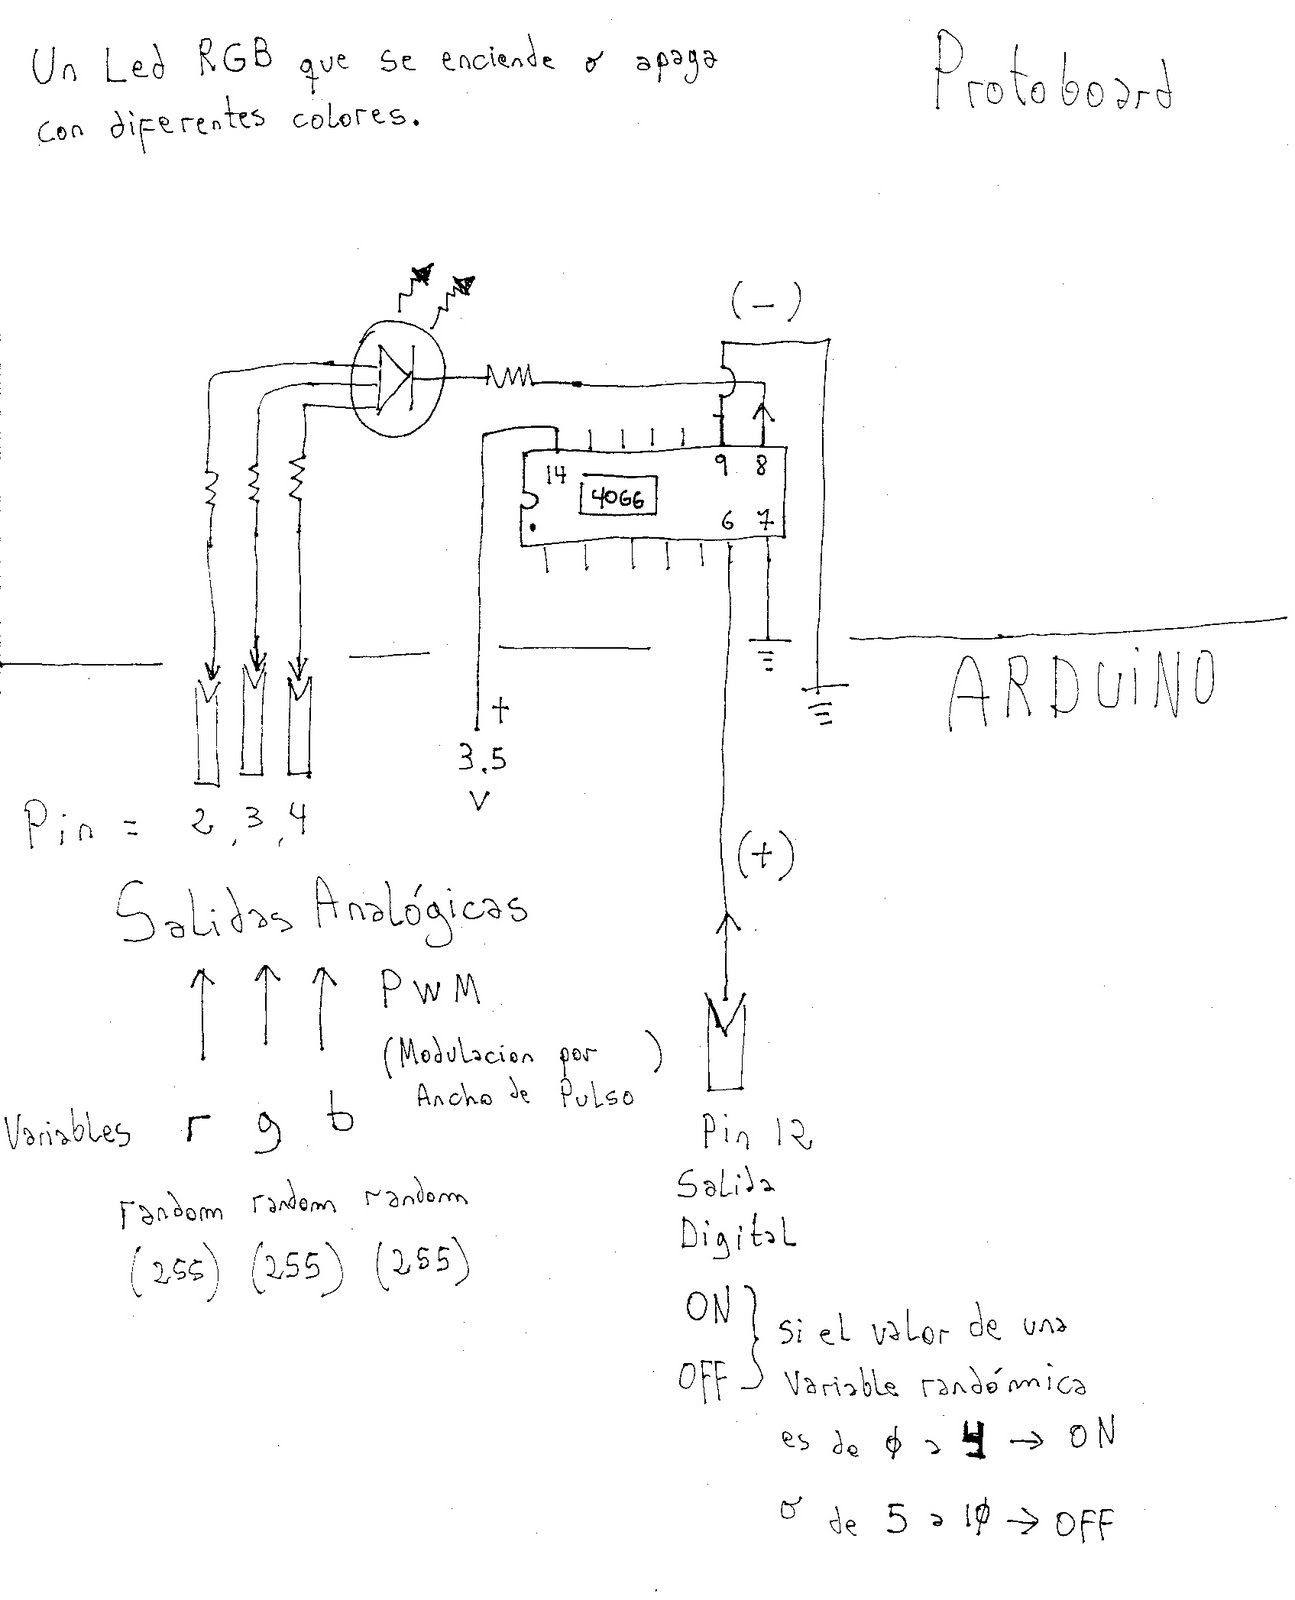 Circuito Led : Led´s. circuitos. el chip 4066. pwm. arduino para controlar todo